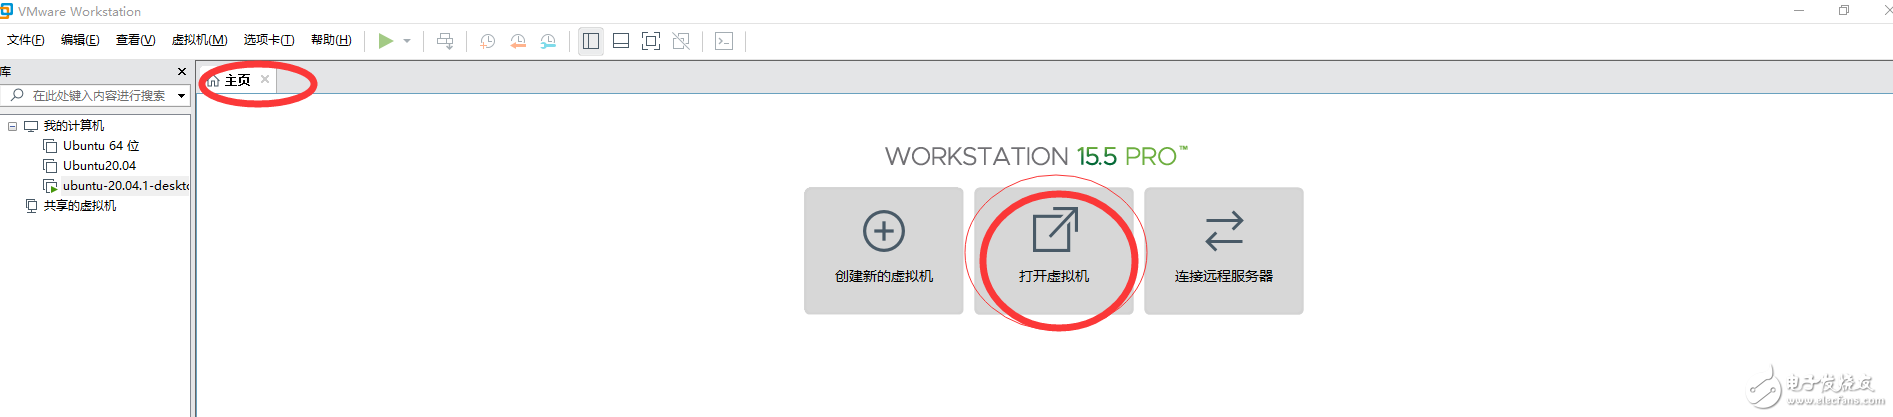 Hi3861 wifi-Iot Ubuntu20.04 环境配置